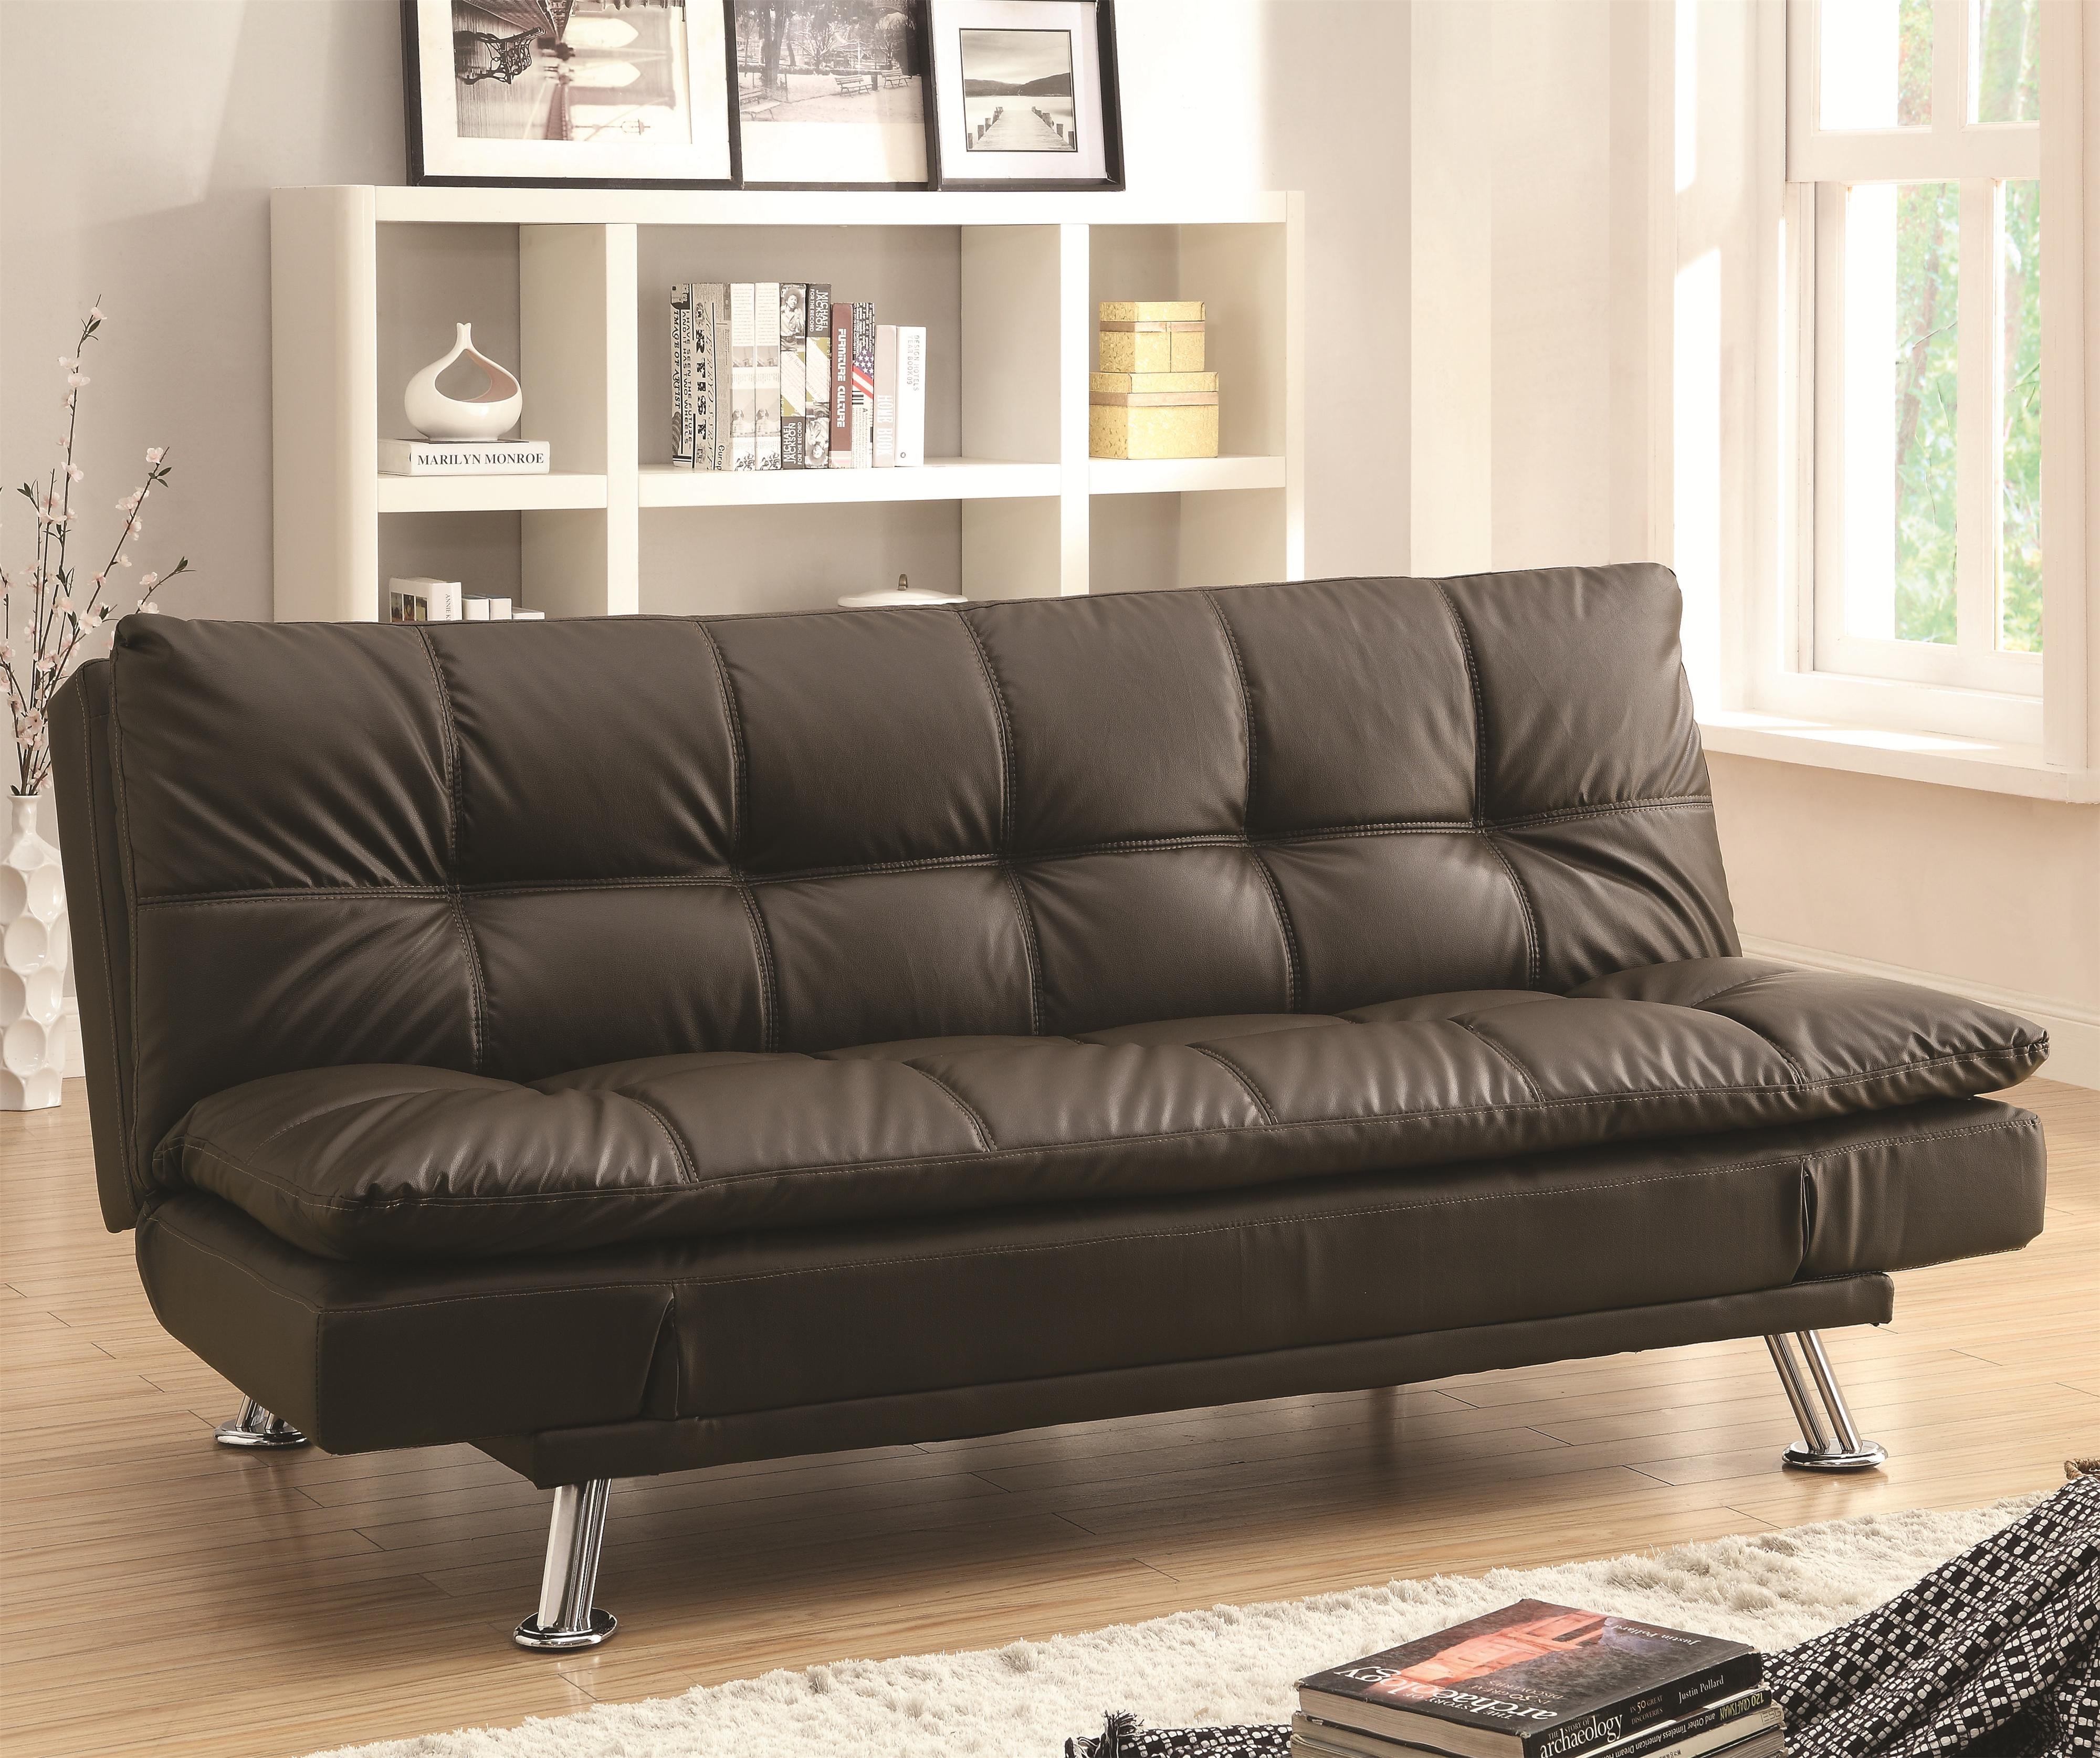 coasters sofa bed sabrina lounger coaster dilleston in futon style with chrome legs